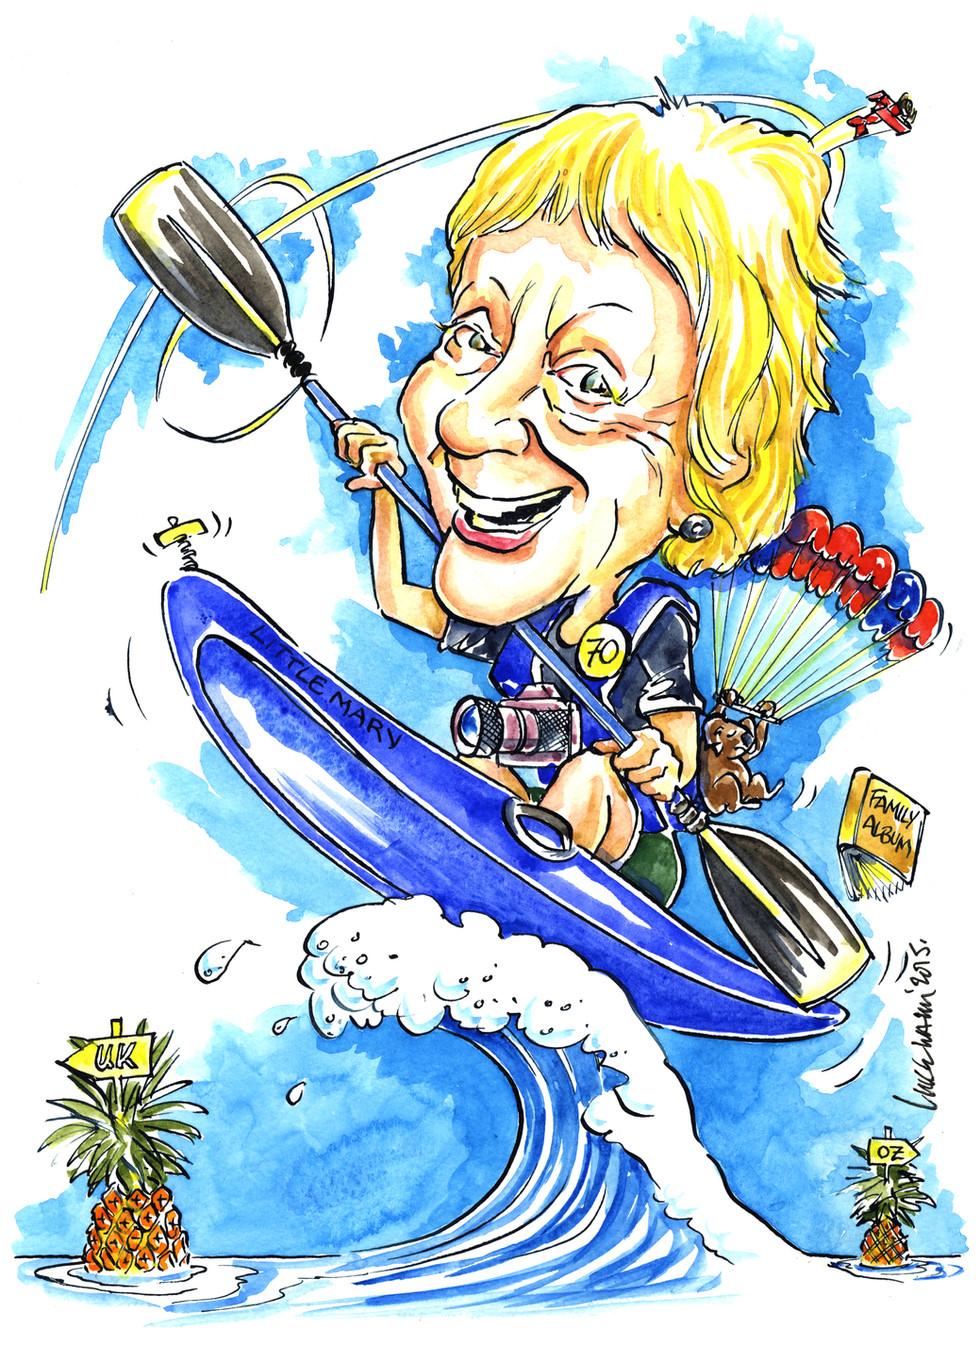 70th Birthday Kayaking Caricature